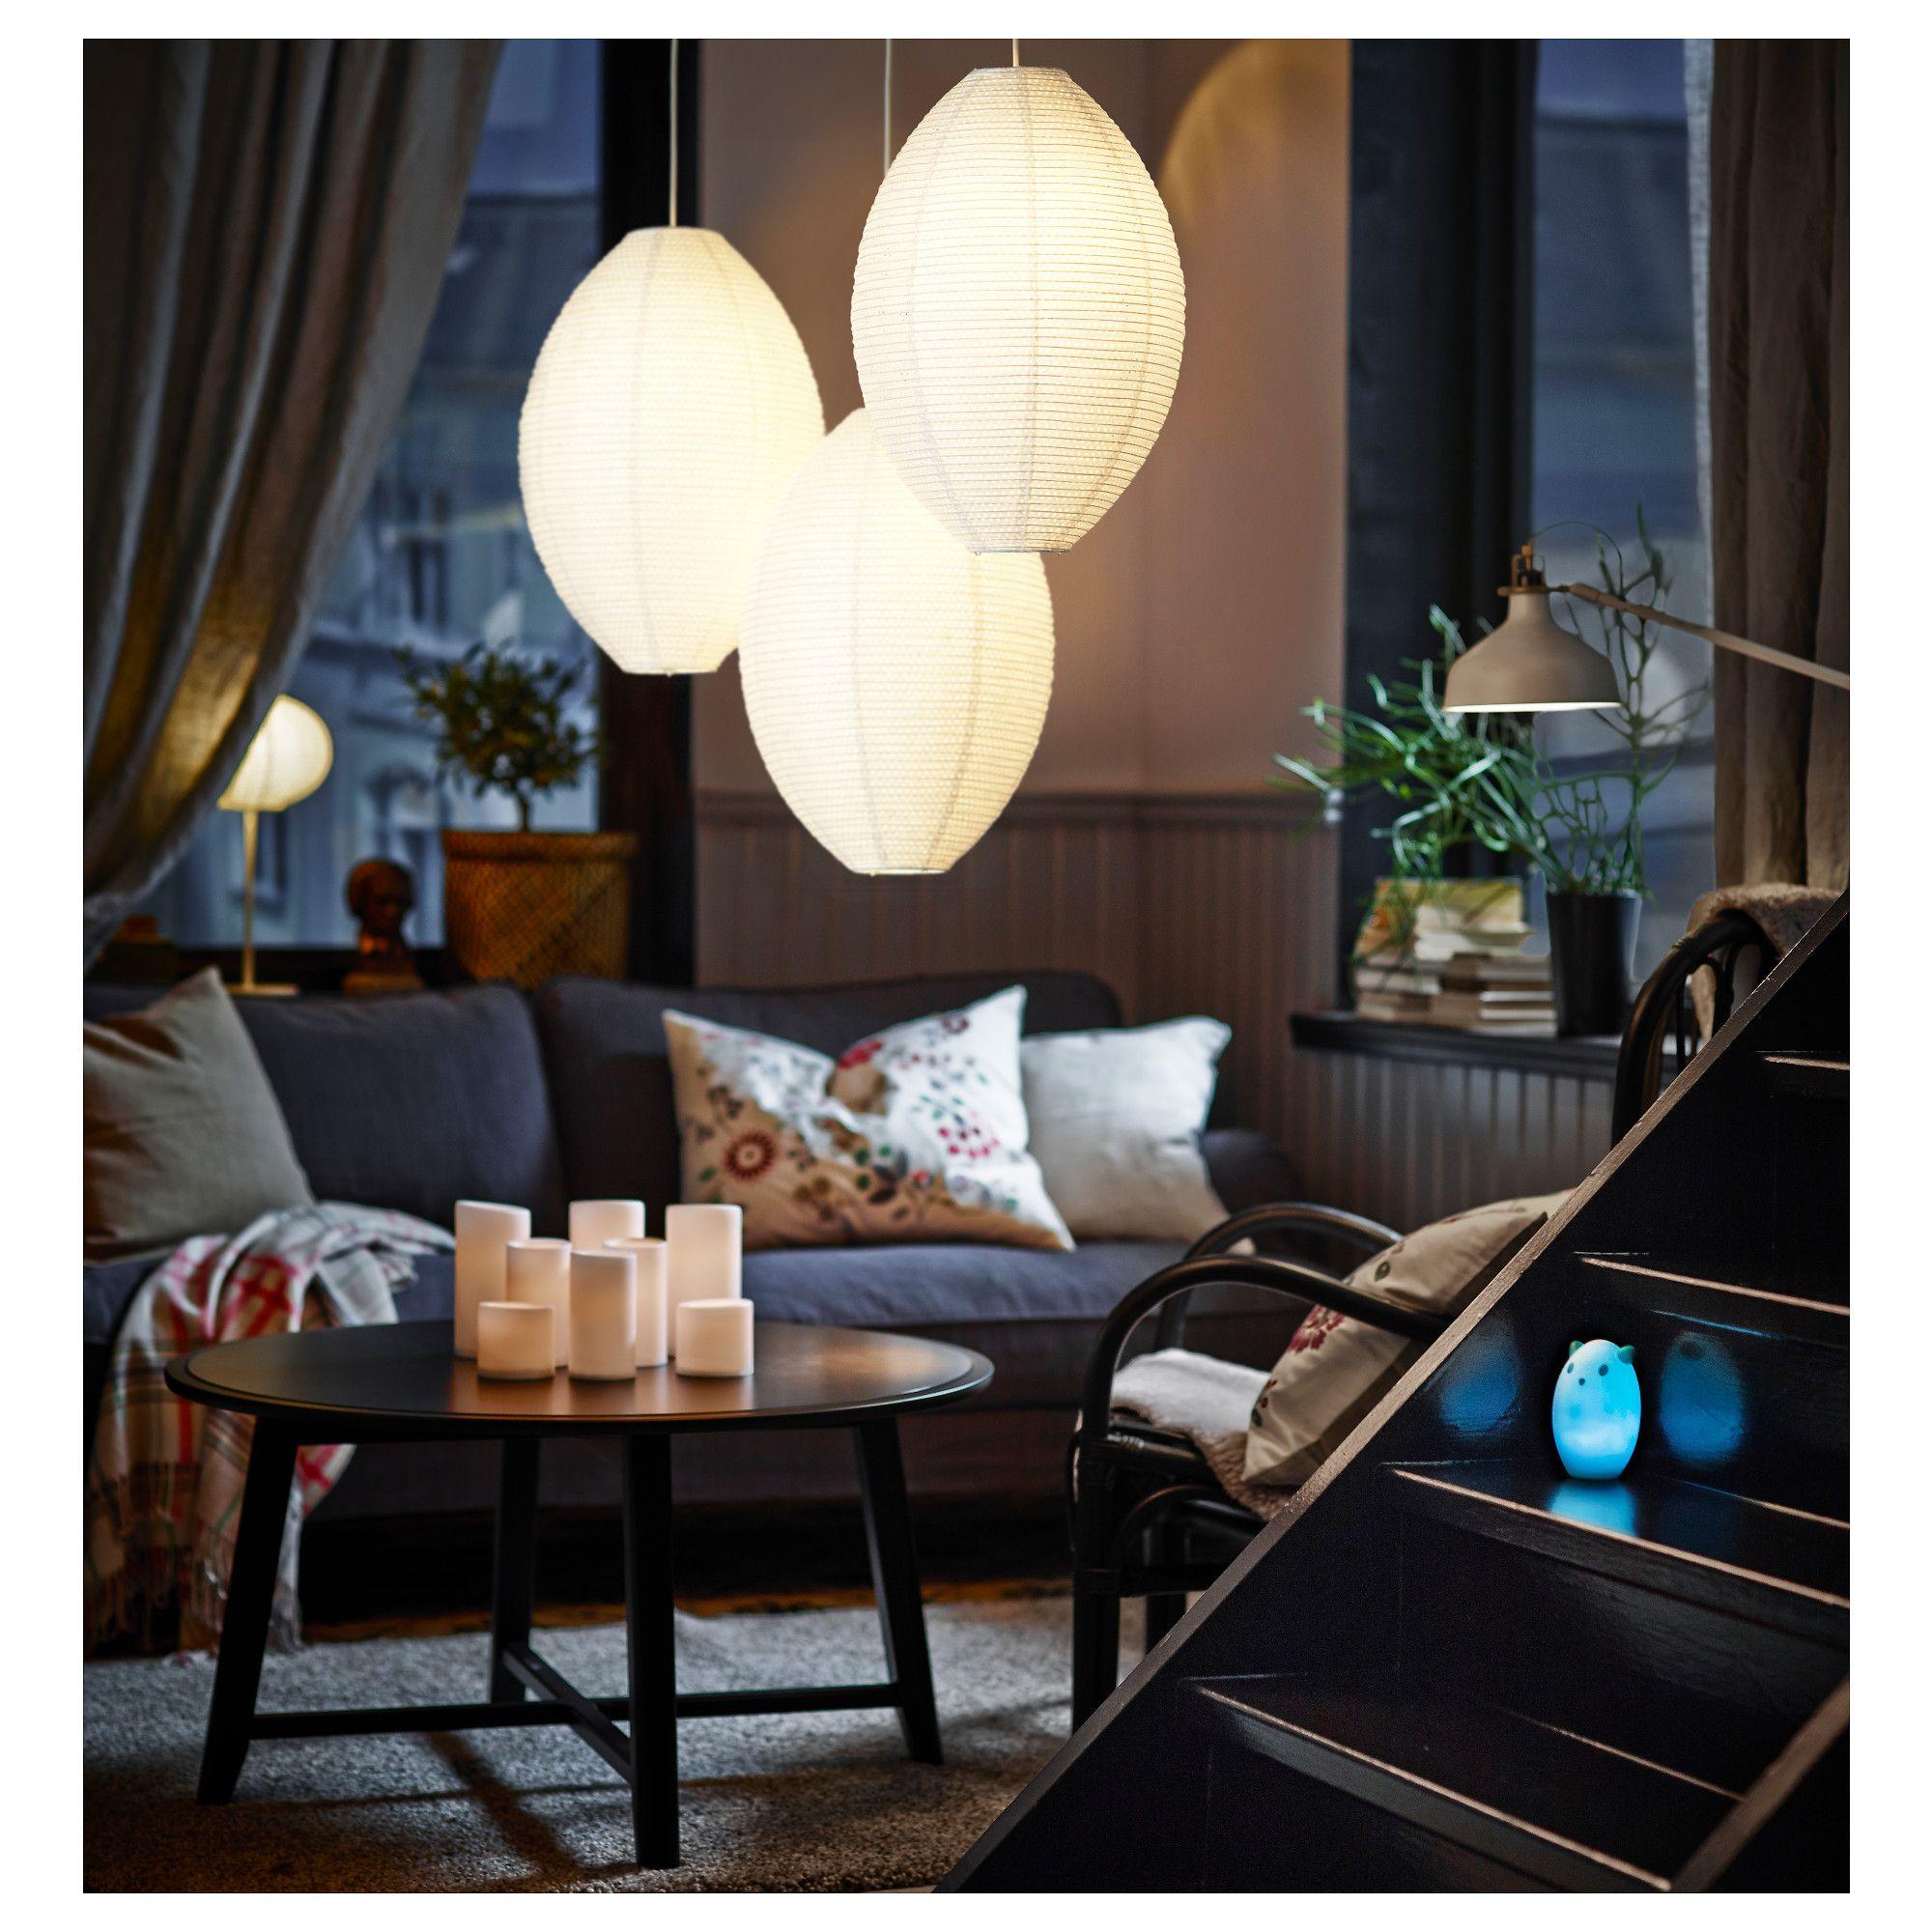 HEMMA Triple cord set white 1.8 m in 2020 | Ikea living